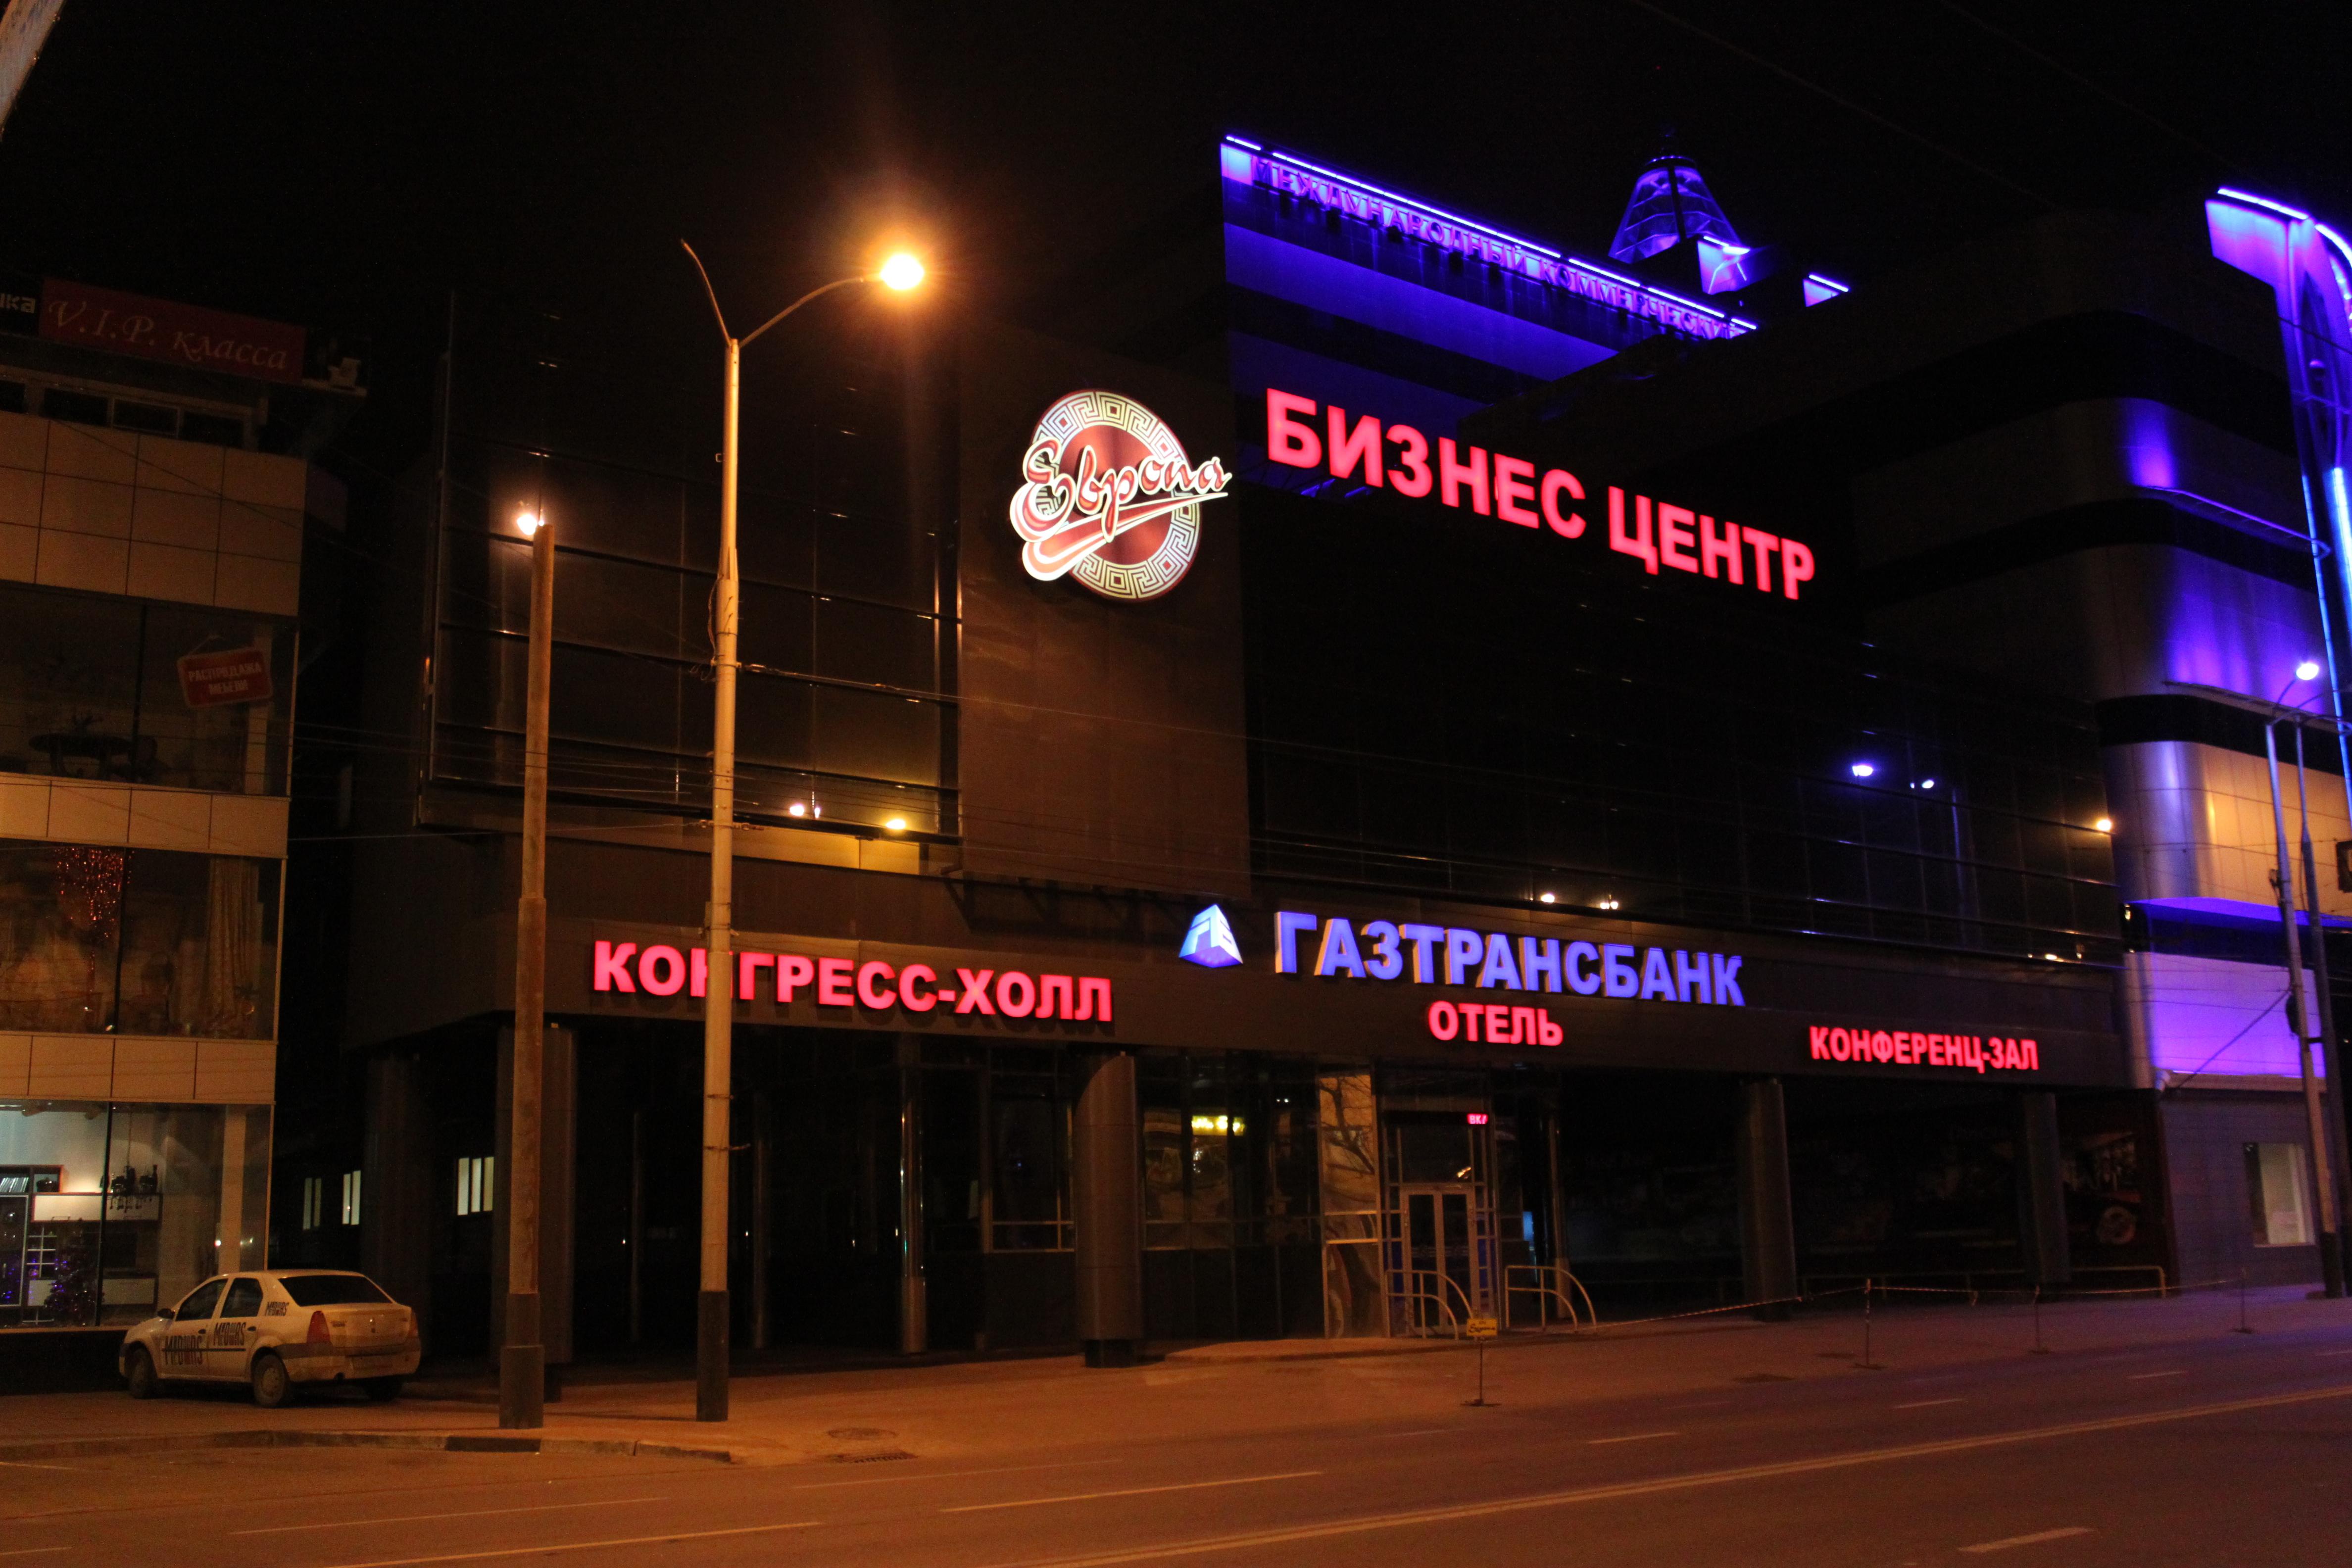 Europa, Krasnodar gorsovet